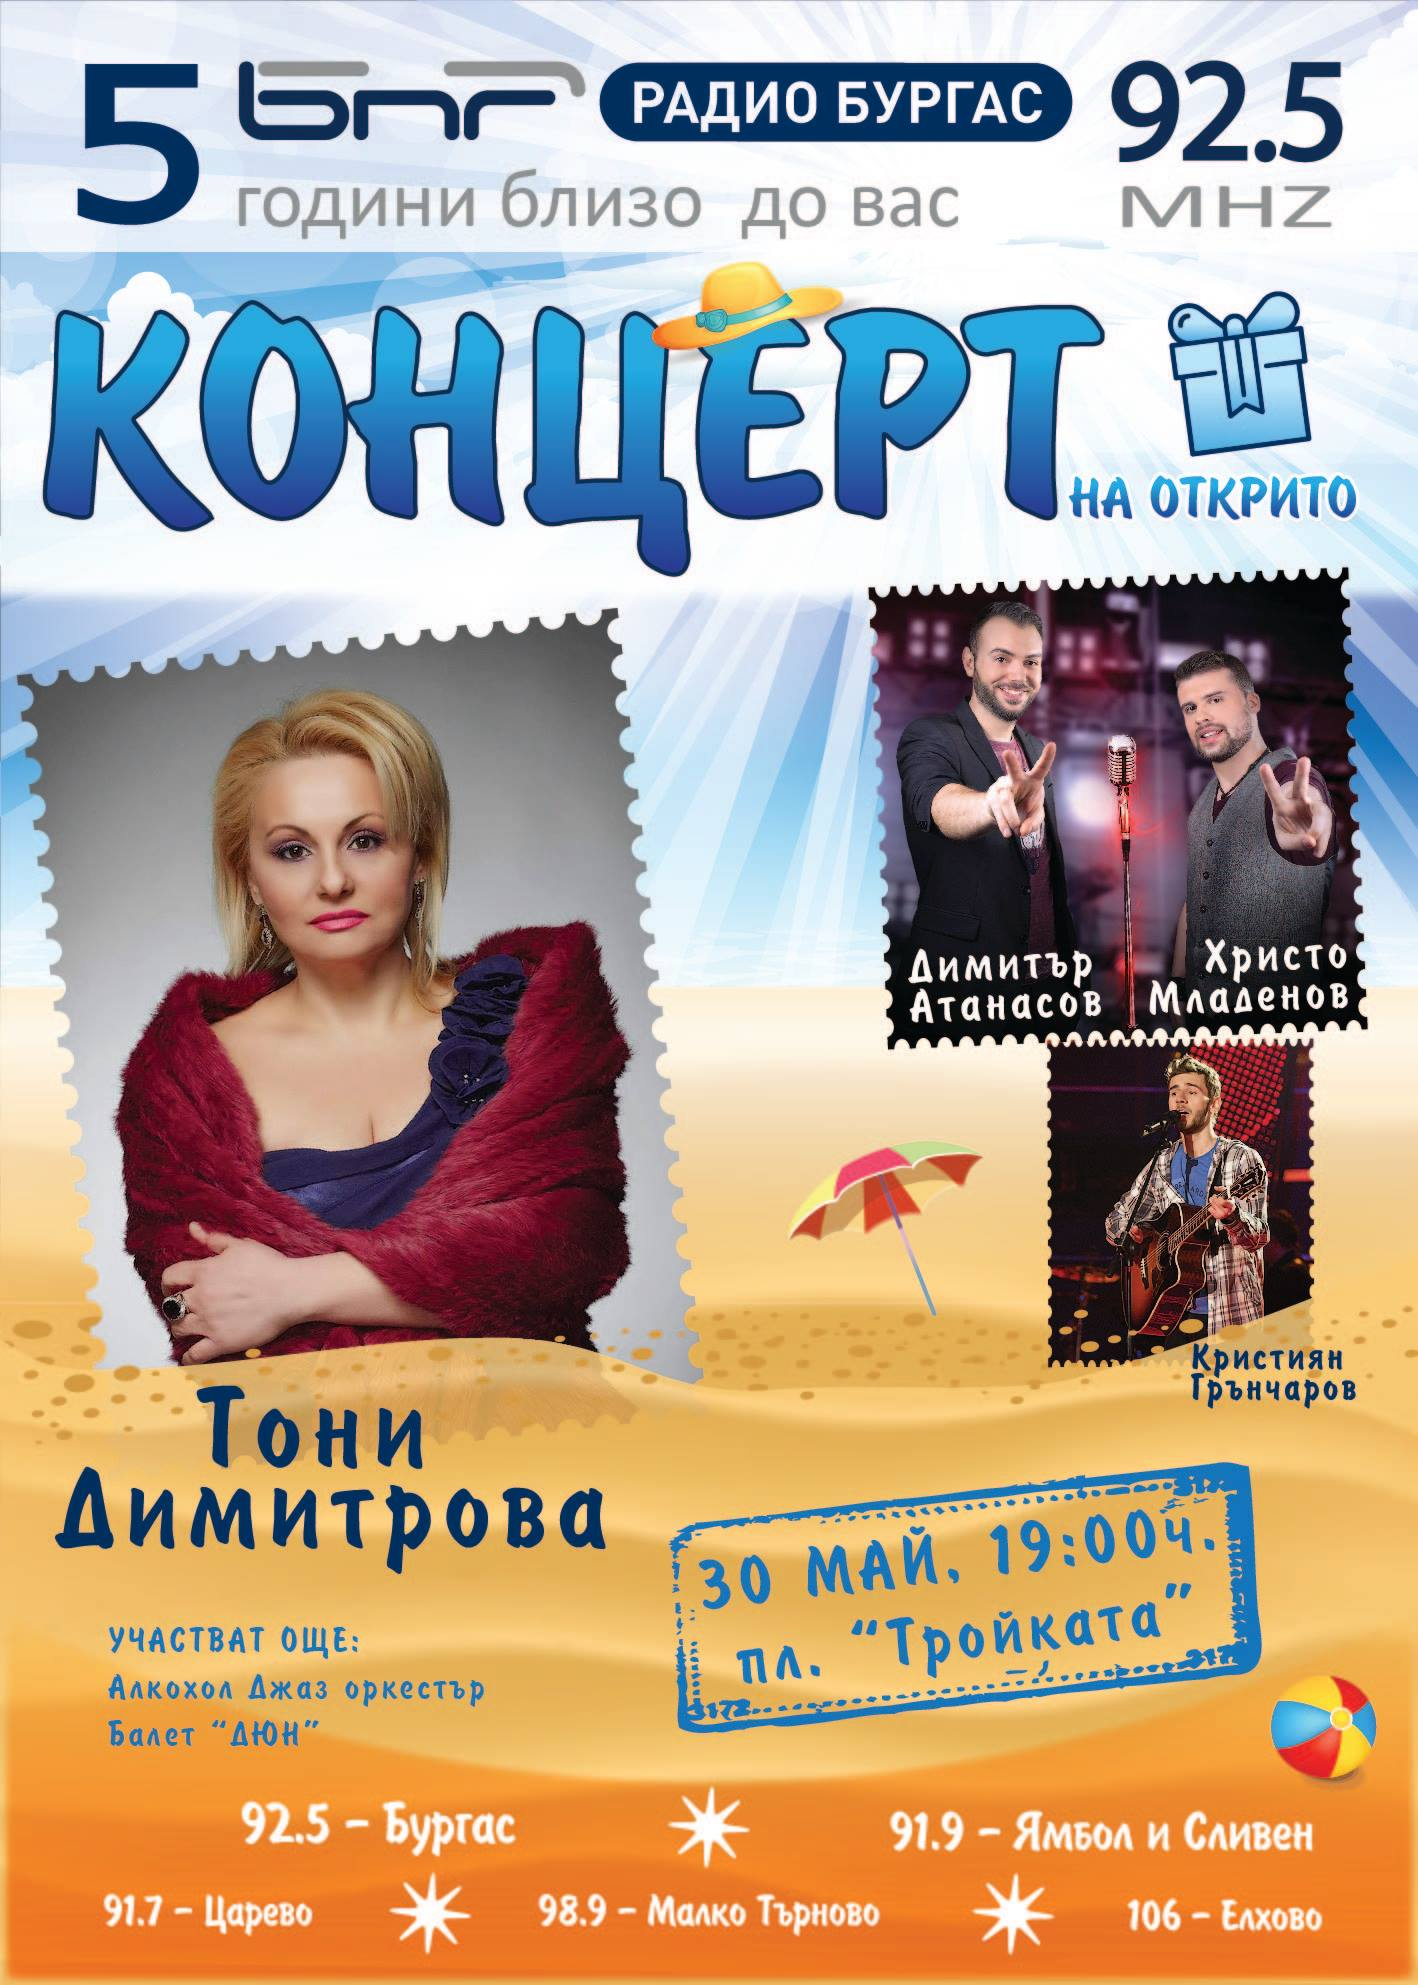 Радио Бургас подарява бургаски концерт на своите приятели